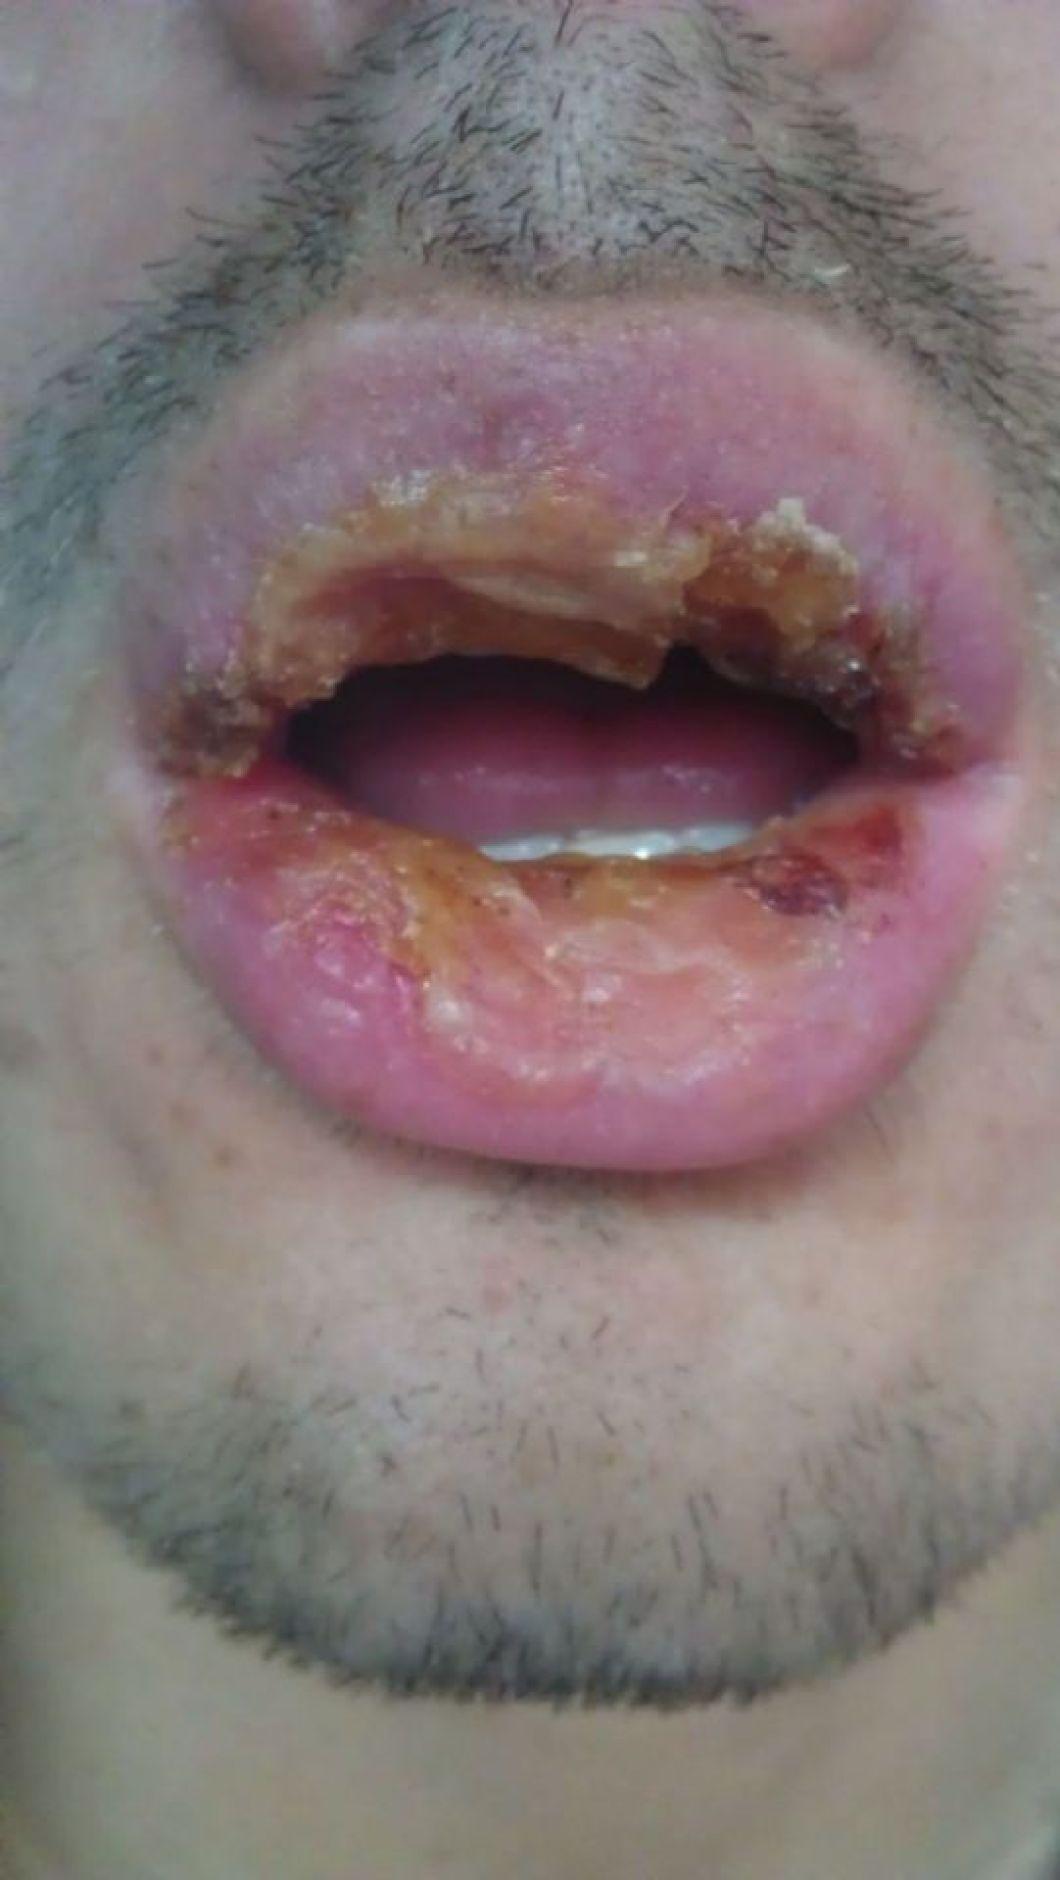 Exfoliative cheilitis cure 2019